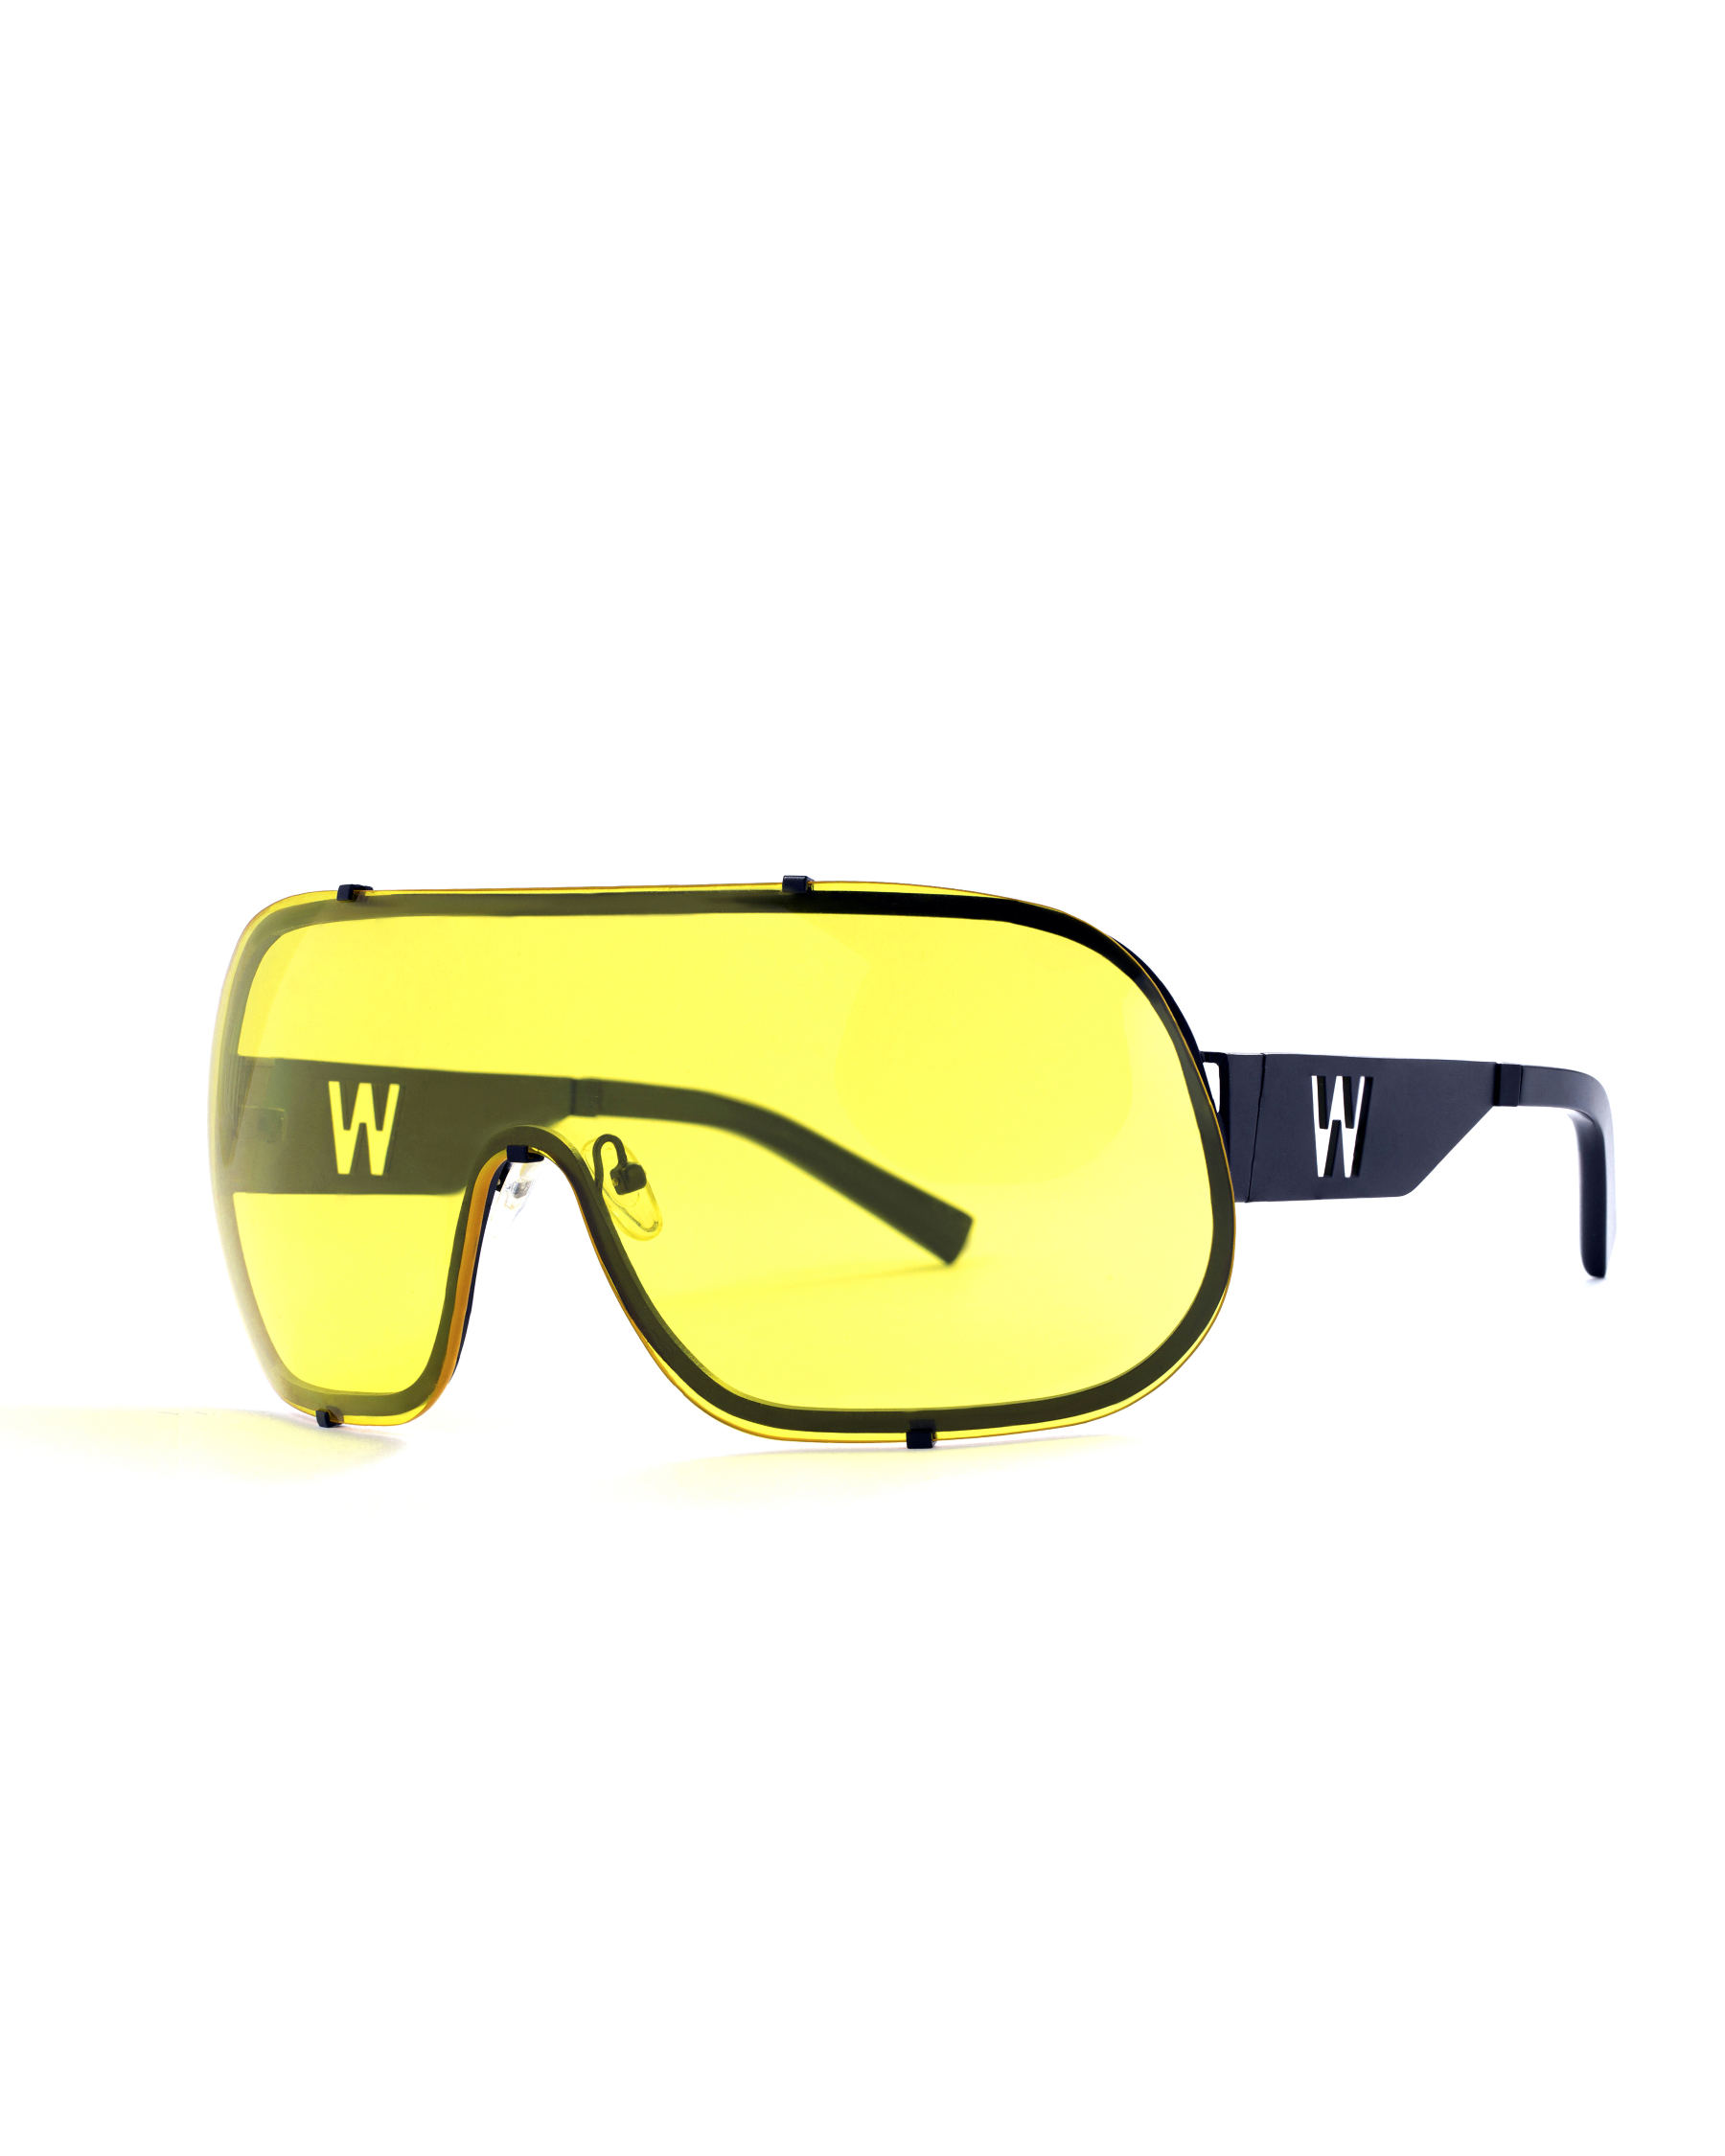 FAKBYFAK x Walter Van Beirendonck  BlitZ Solar Shield Sunglasses. Yellow Code: 23/01/01